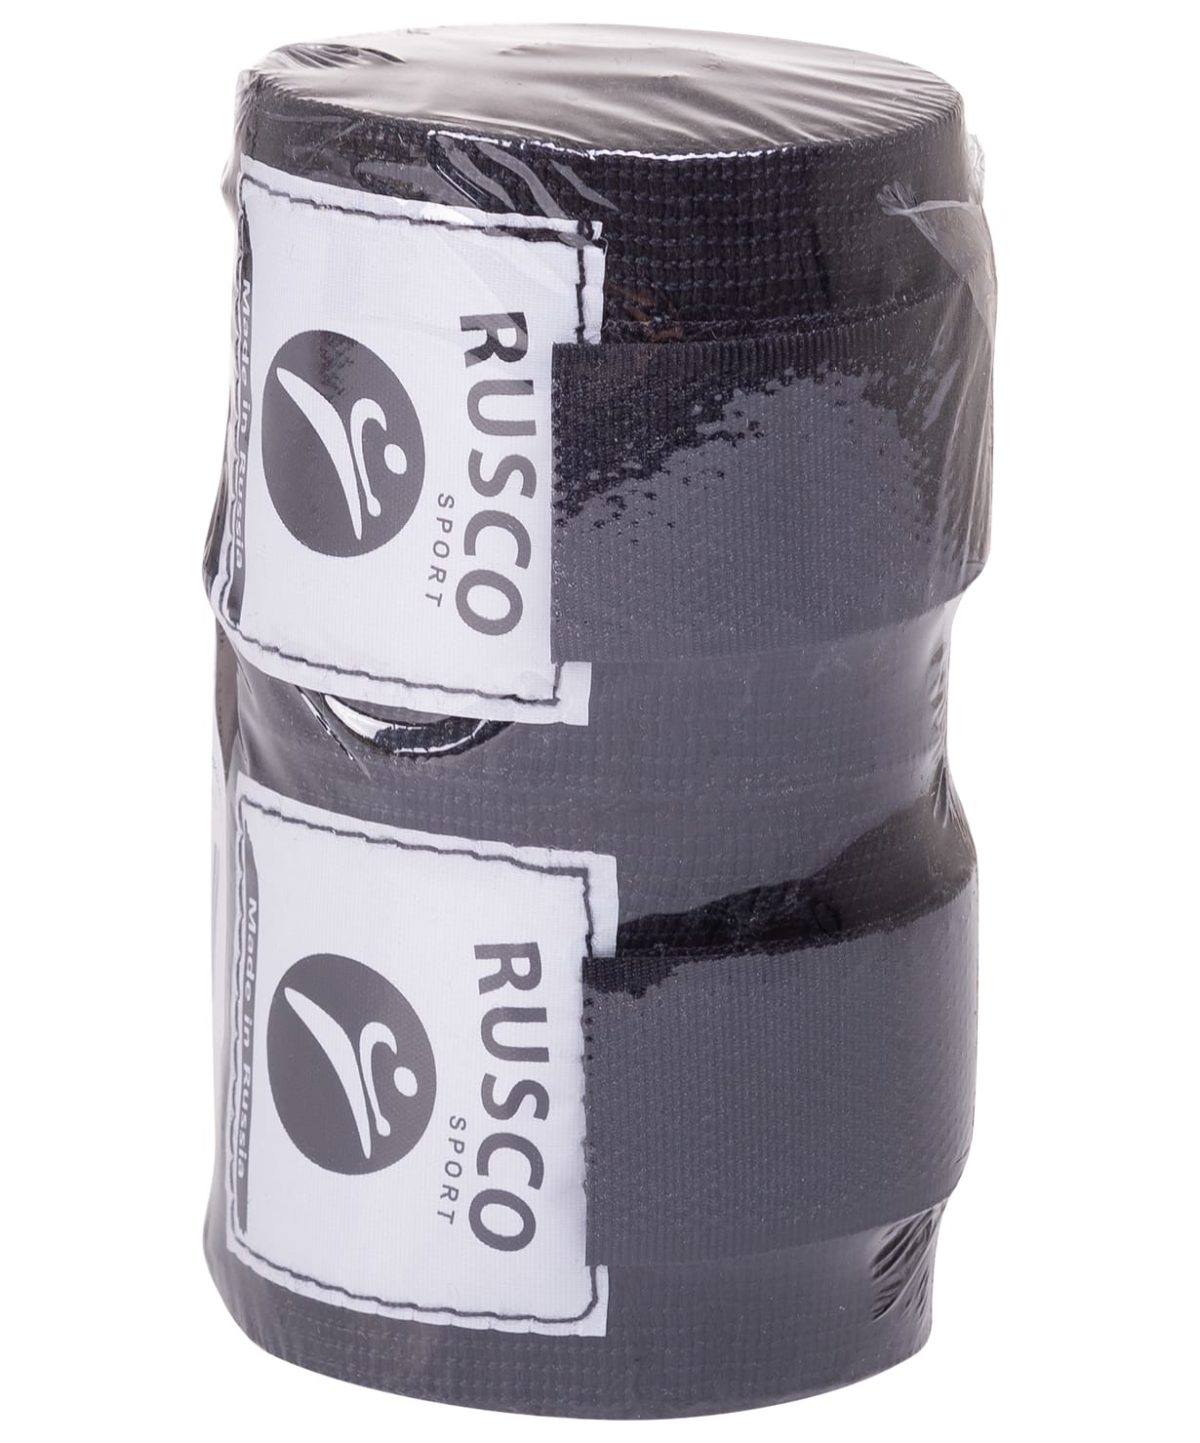 RUSCO Бинт боксерский, 3,5м, хлопок  126: чёрный - 2